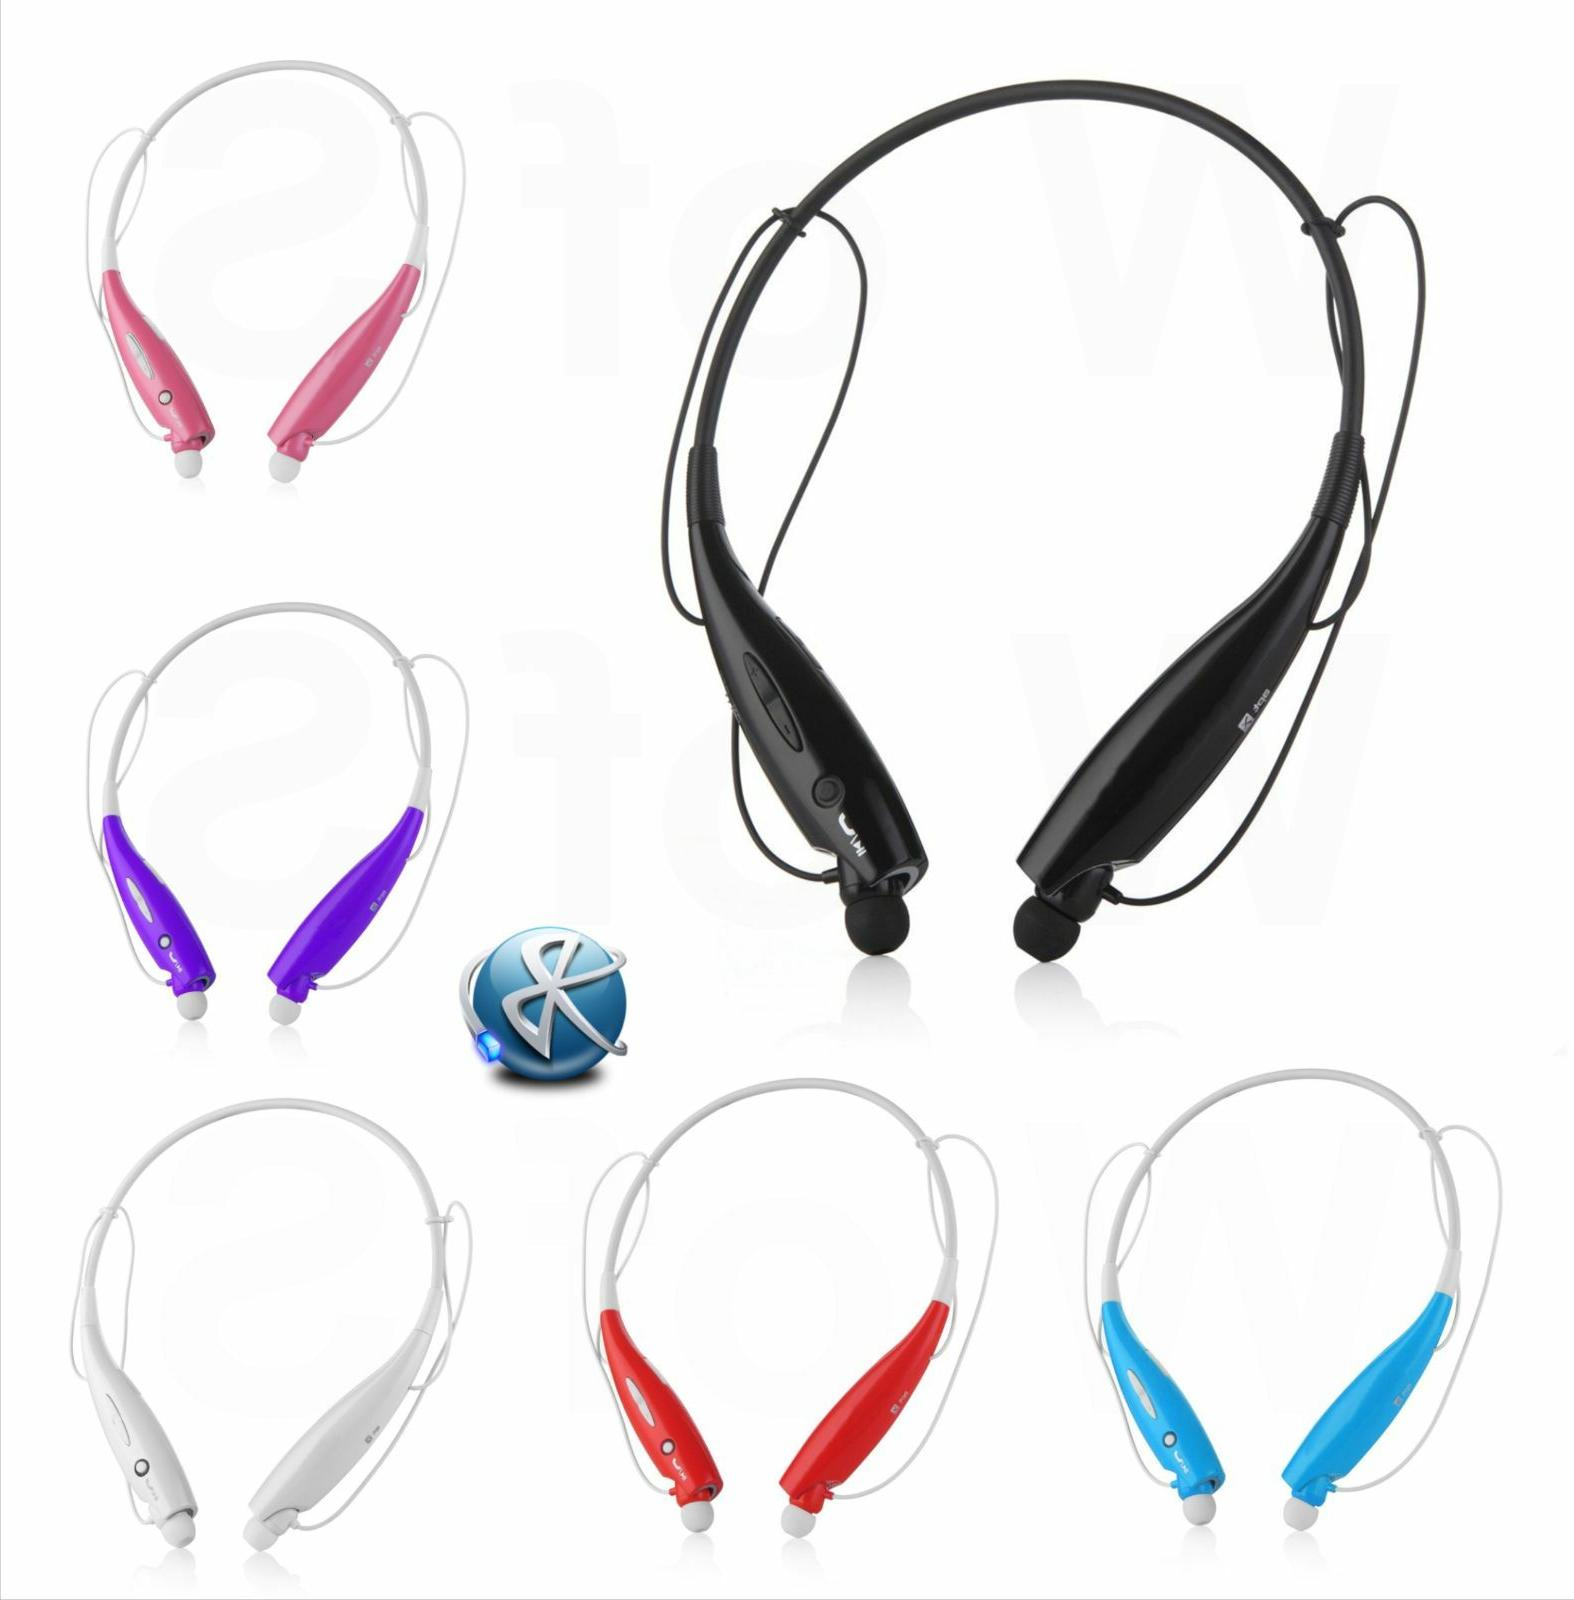 wireless bluetooth headset stereo headphone earphone sport